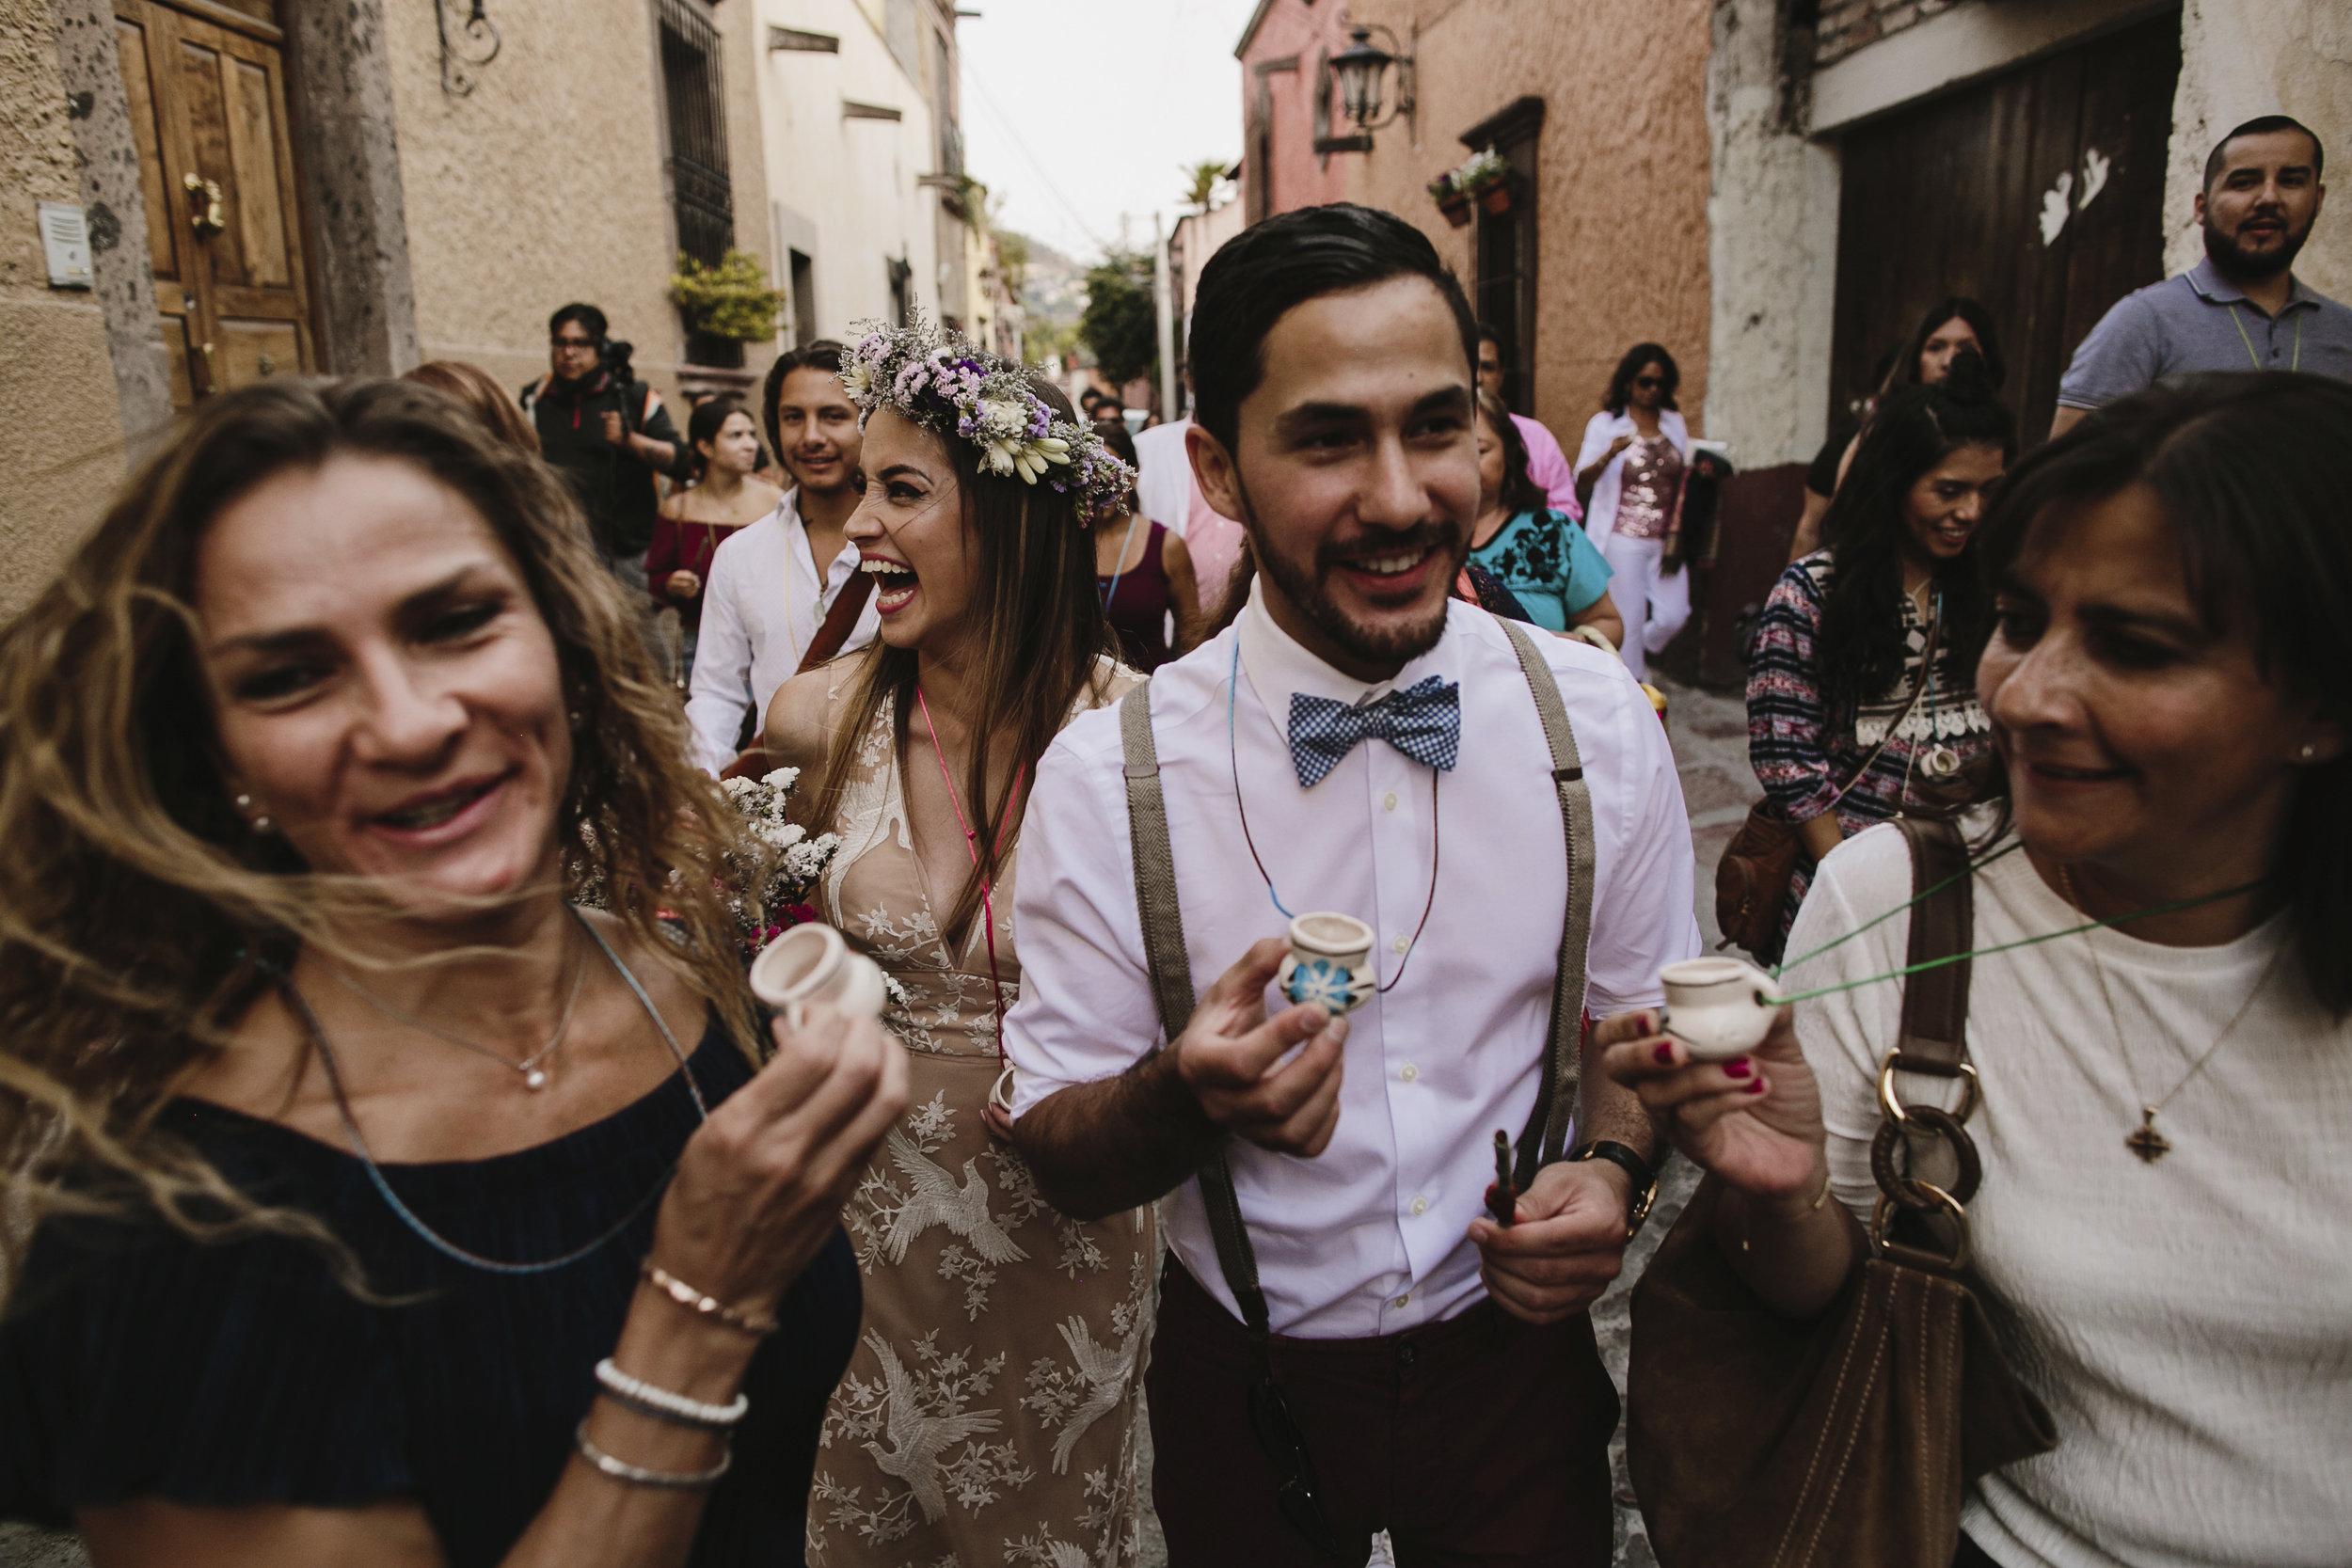 alfons_flores_destination_wedding_photography_mavi_david-372.JPG